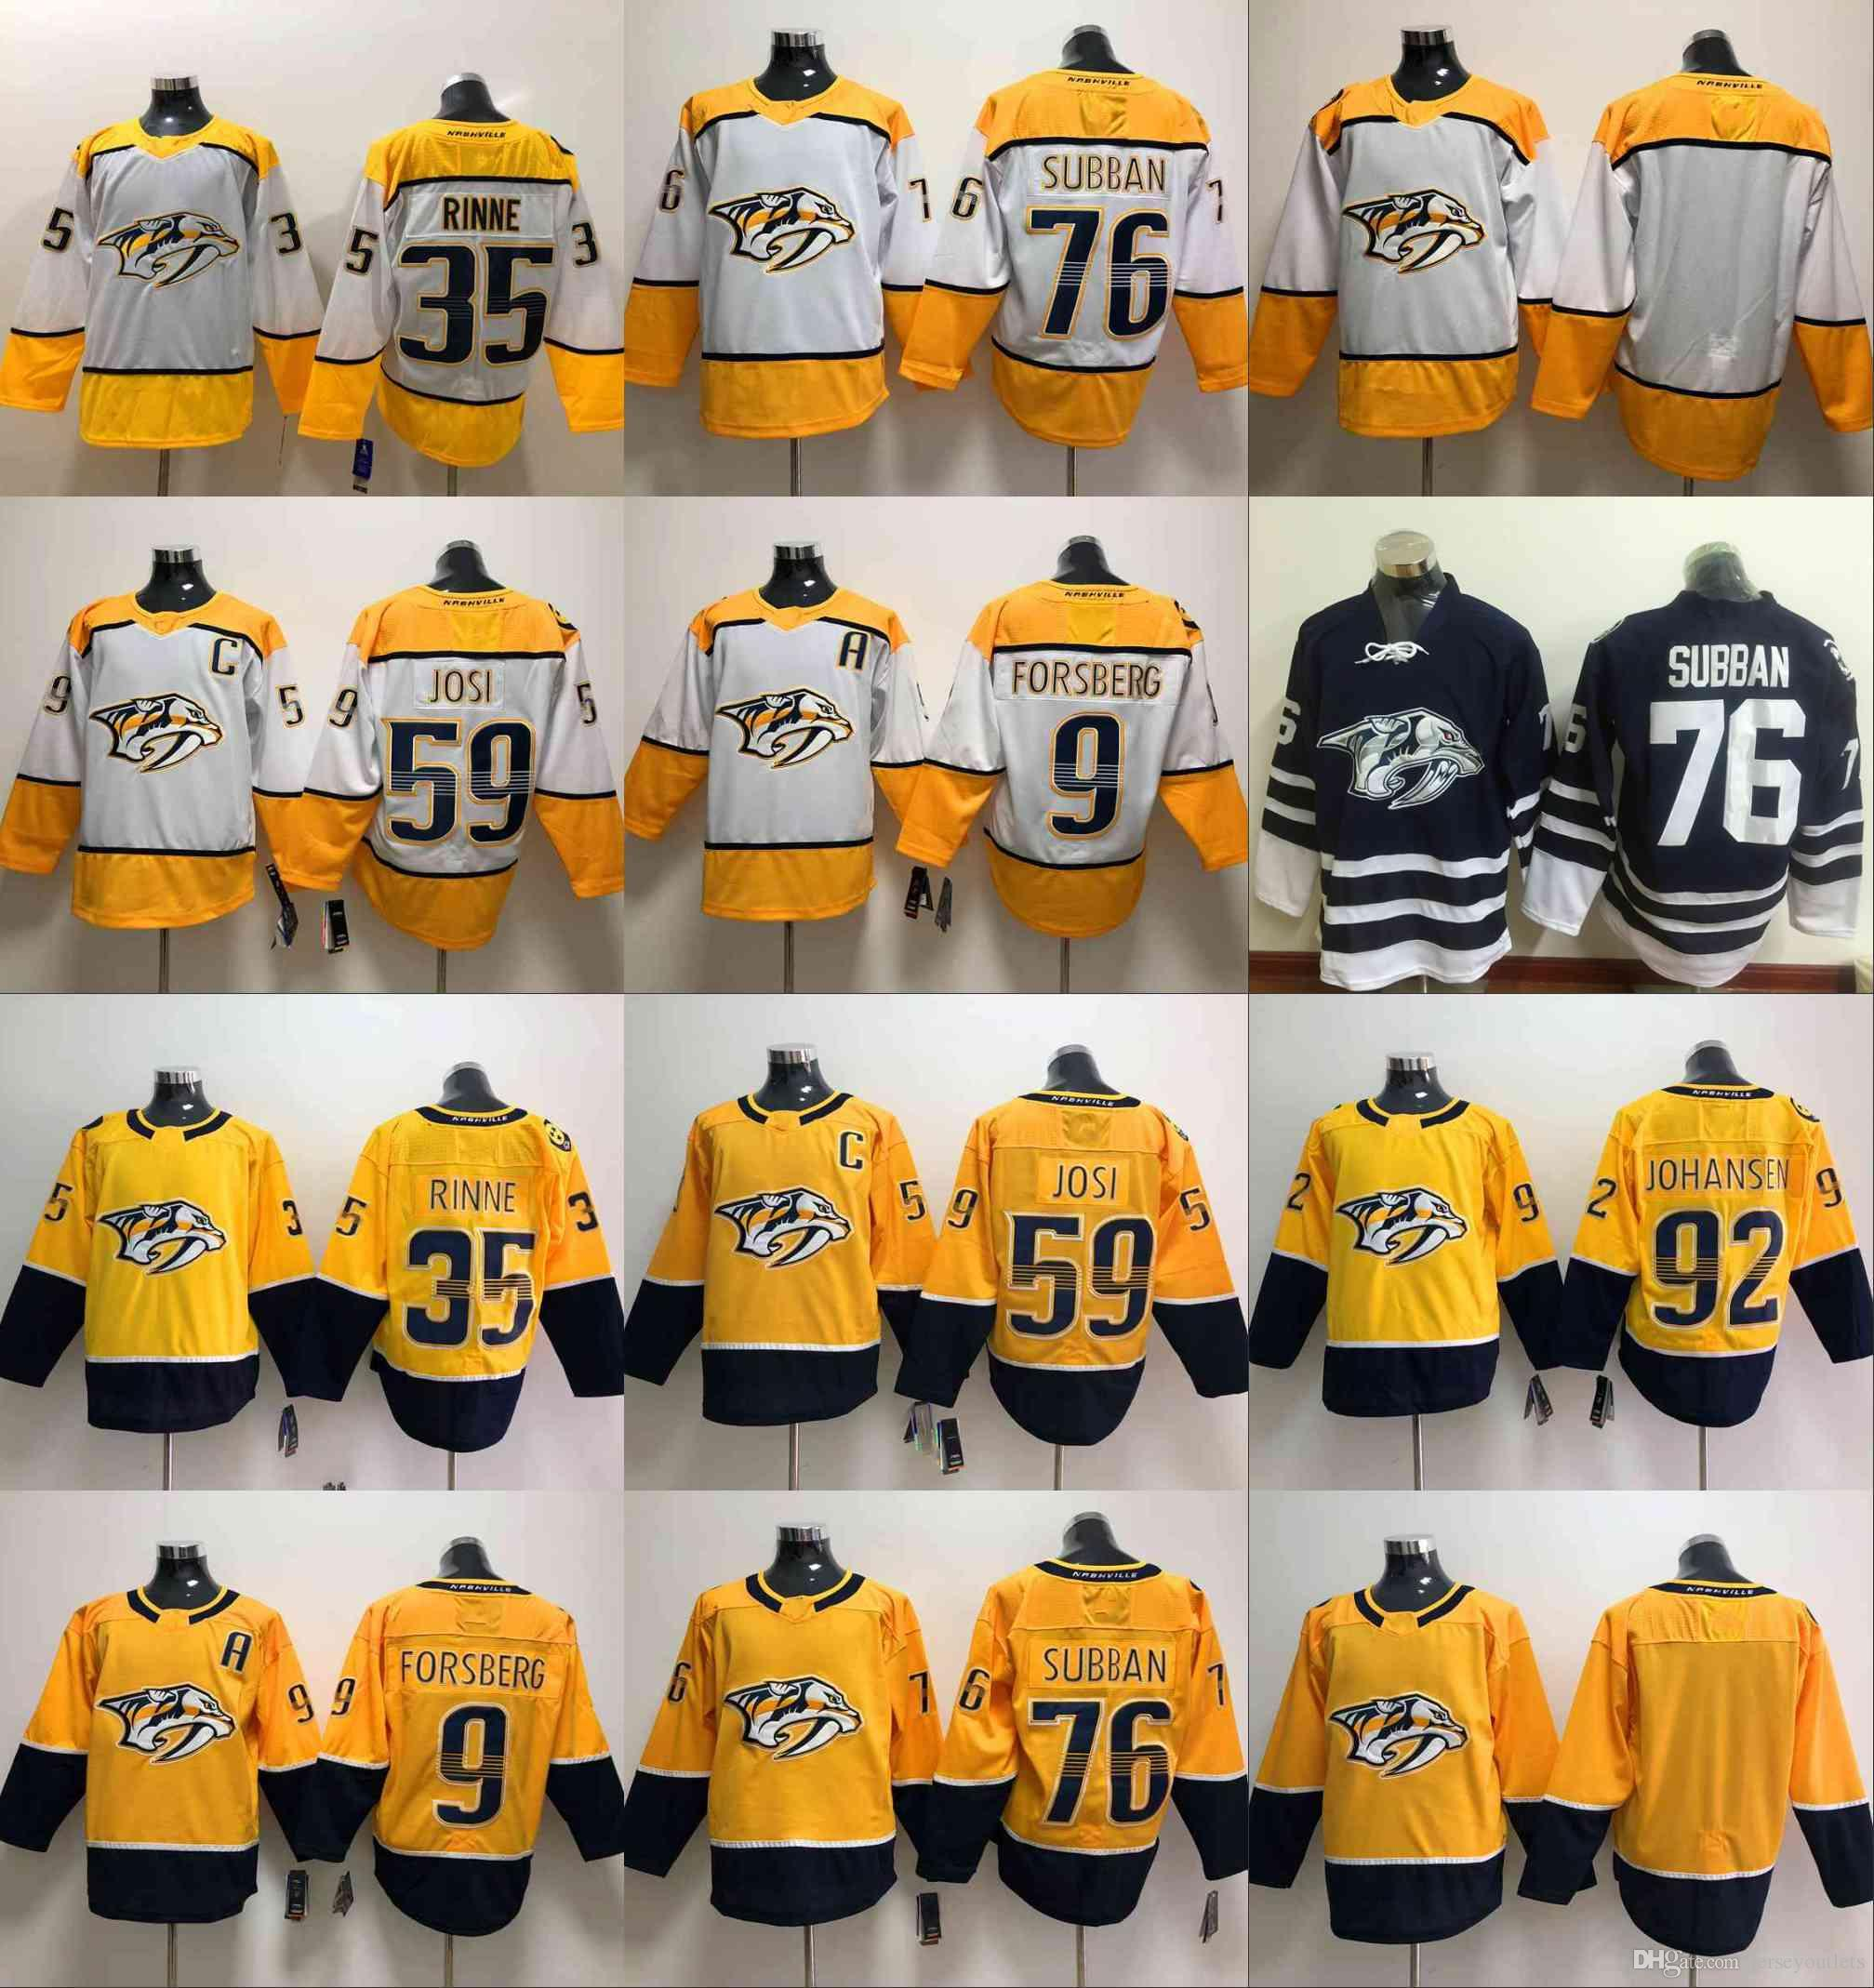 new arrival 3e958 1355b 2017 Nashville Predators 76 P.K Subban 35 Pekka Rinne Jersey 92 Ryan  Johansen 59 Roman Josi 9 Filip Forsberg Hockey Jerseys stitched